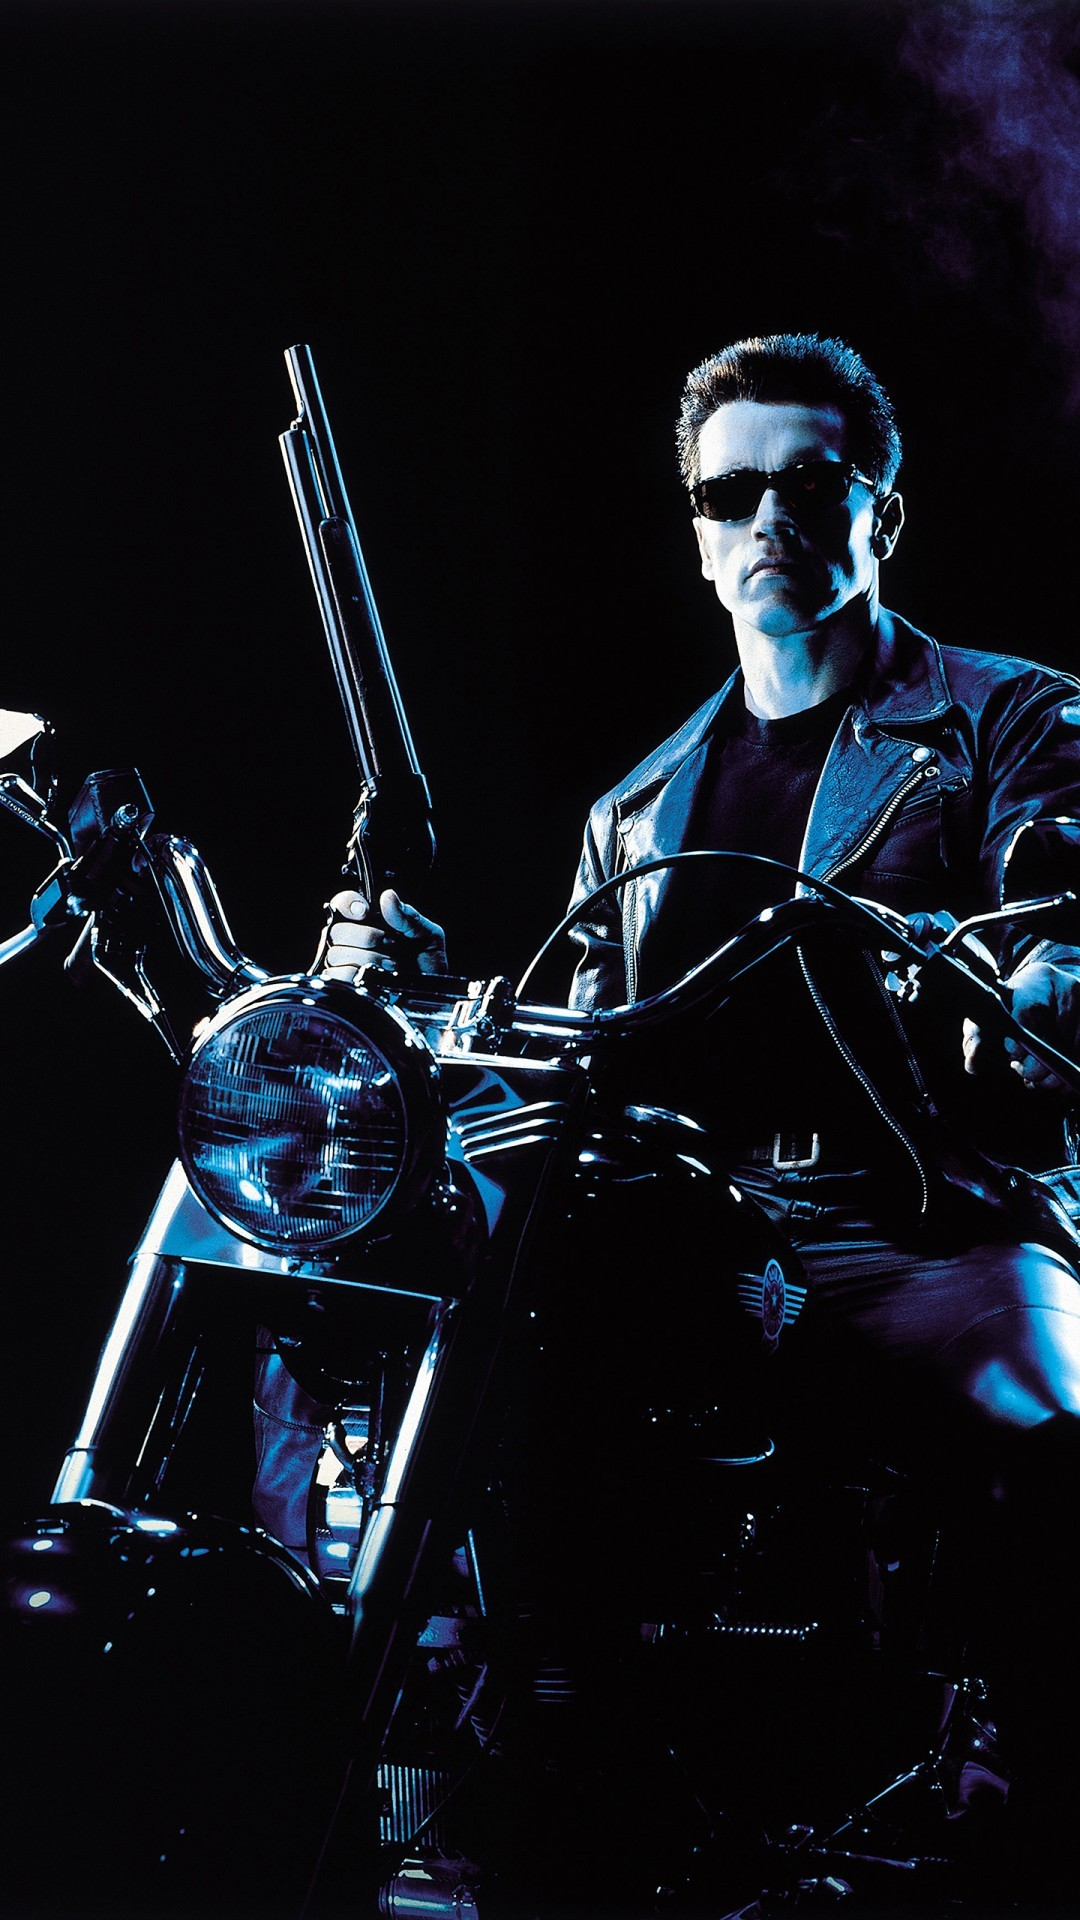 Free Arnold Schwarzenegger in Terminator 2 Judgment Day phone wallpaper by dorlawx36